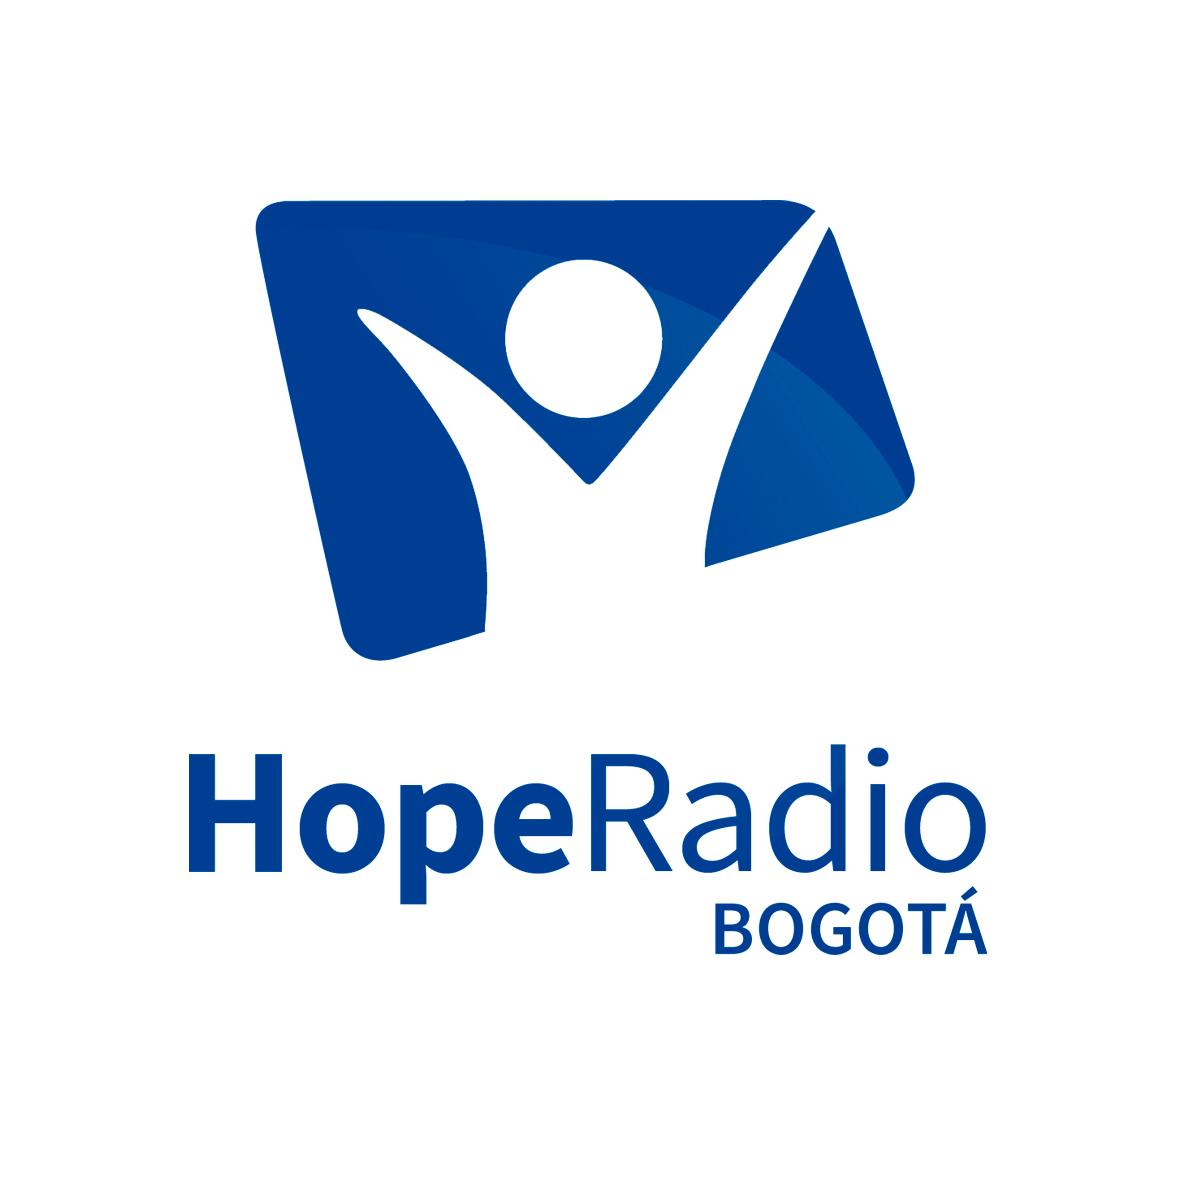 Hope Radio Bogotá